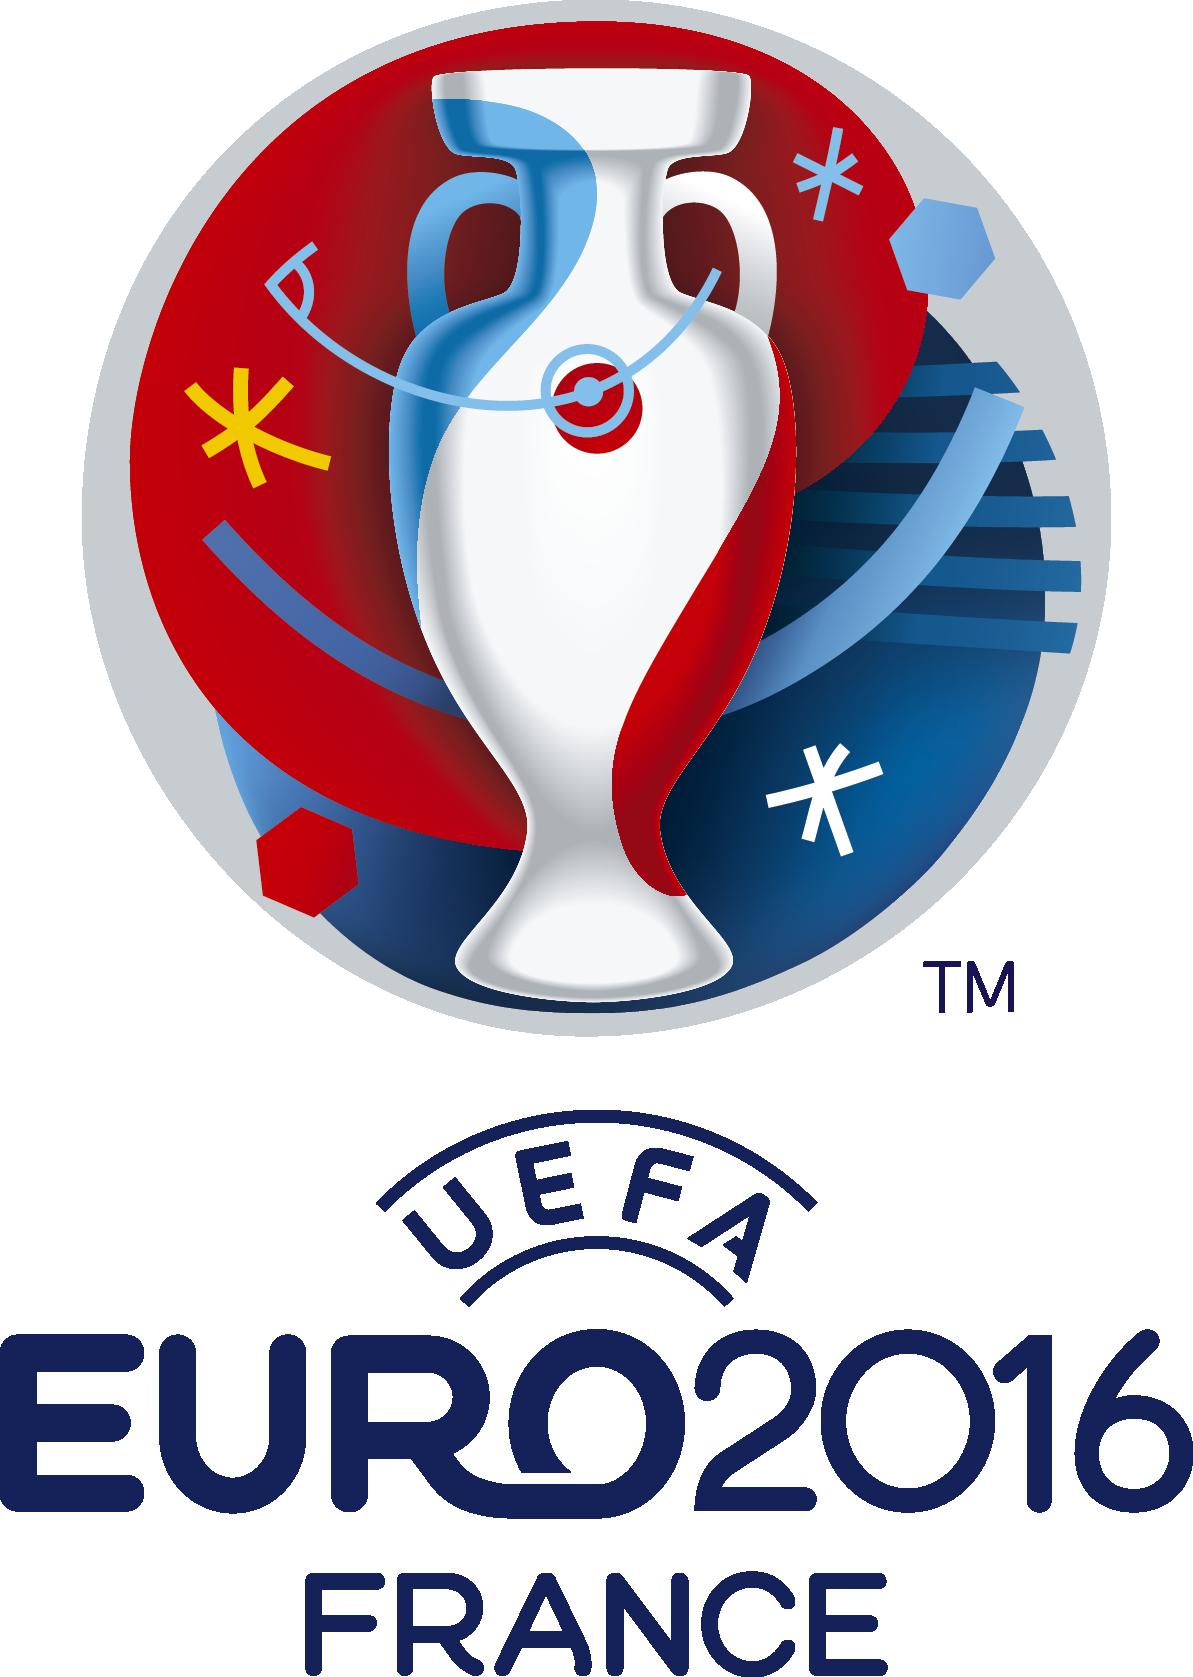 UEFA-EURO-2016-Logo-BrandessenceNigeria.png